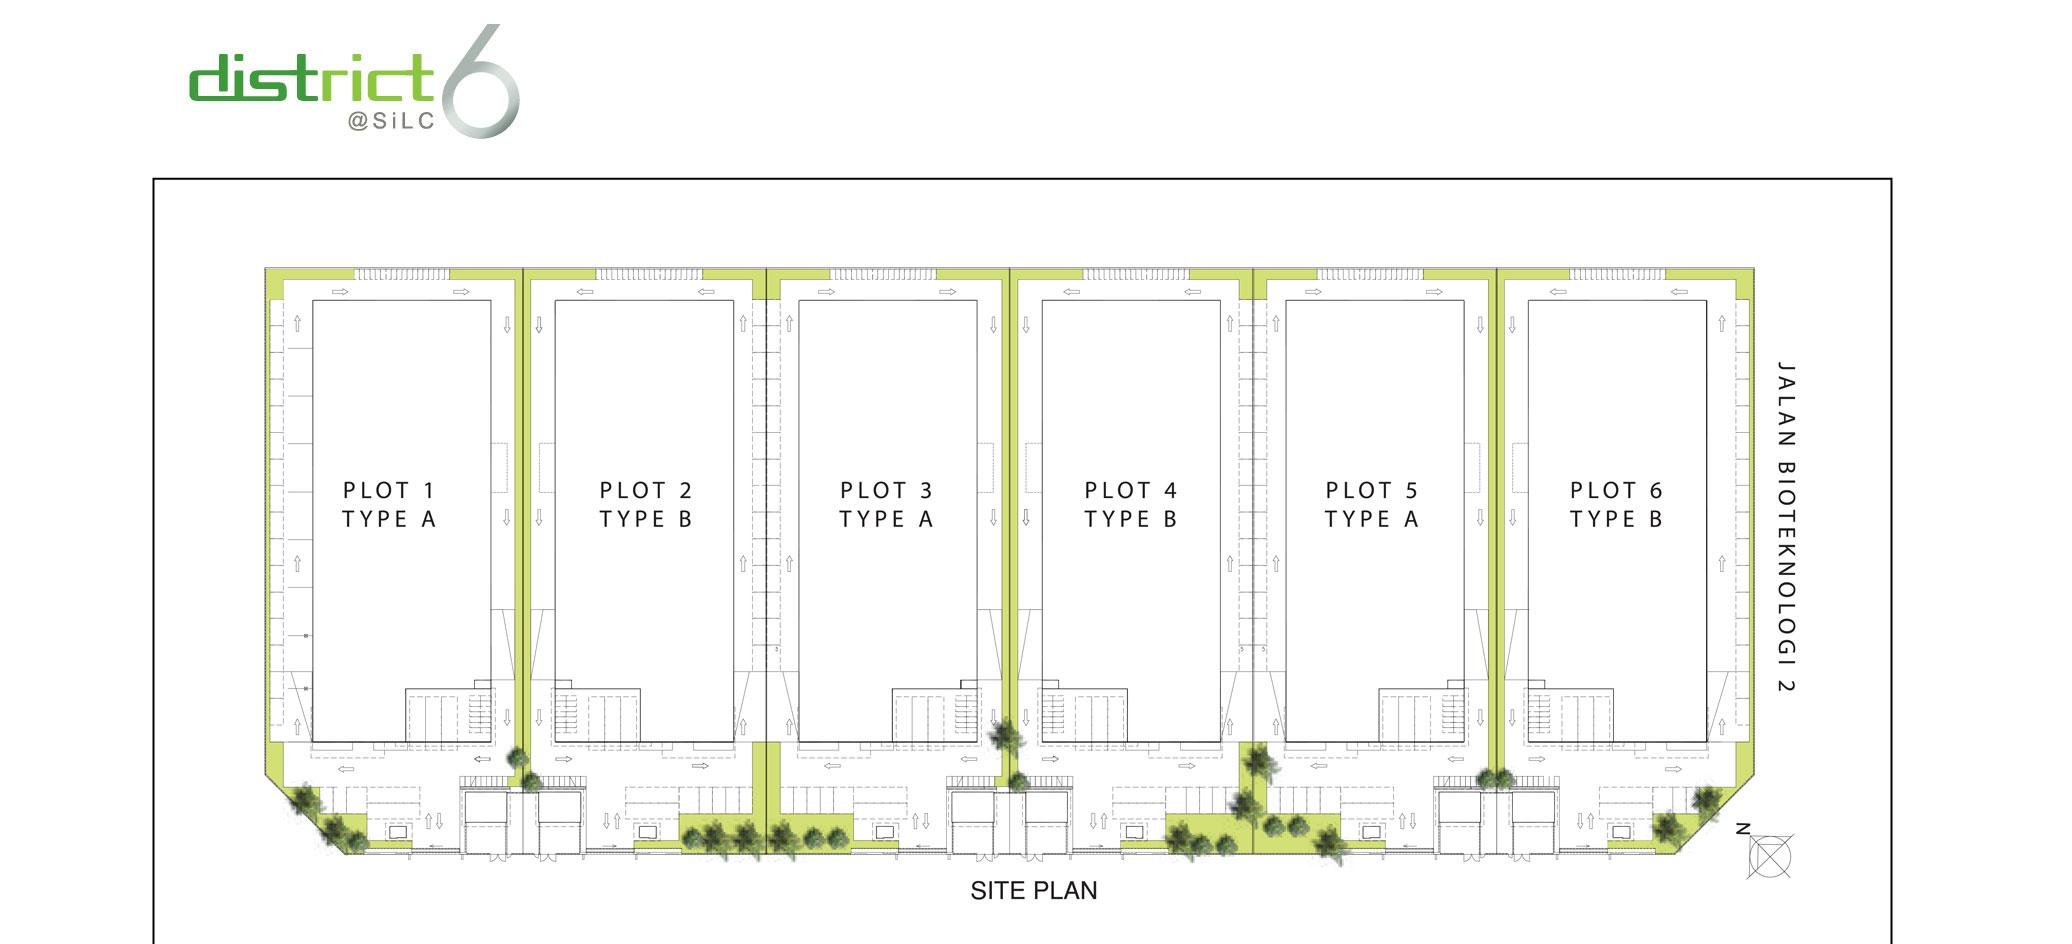 Site Plan of District 6 @ SiLC